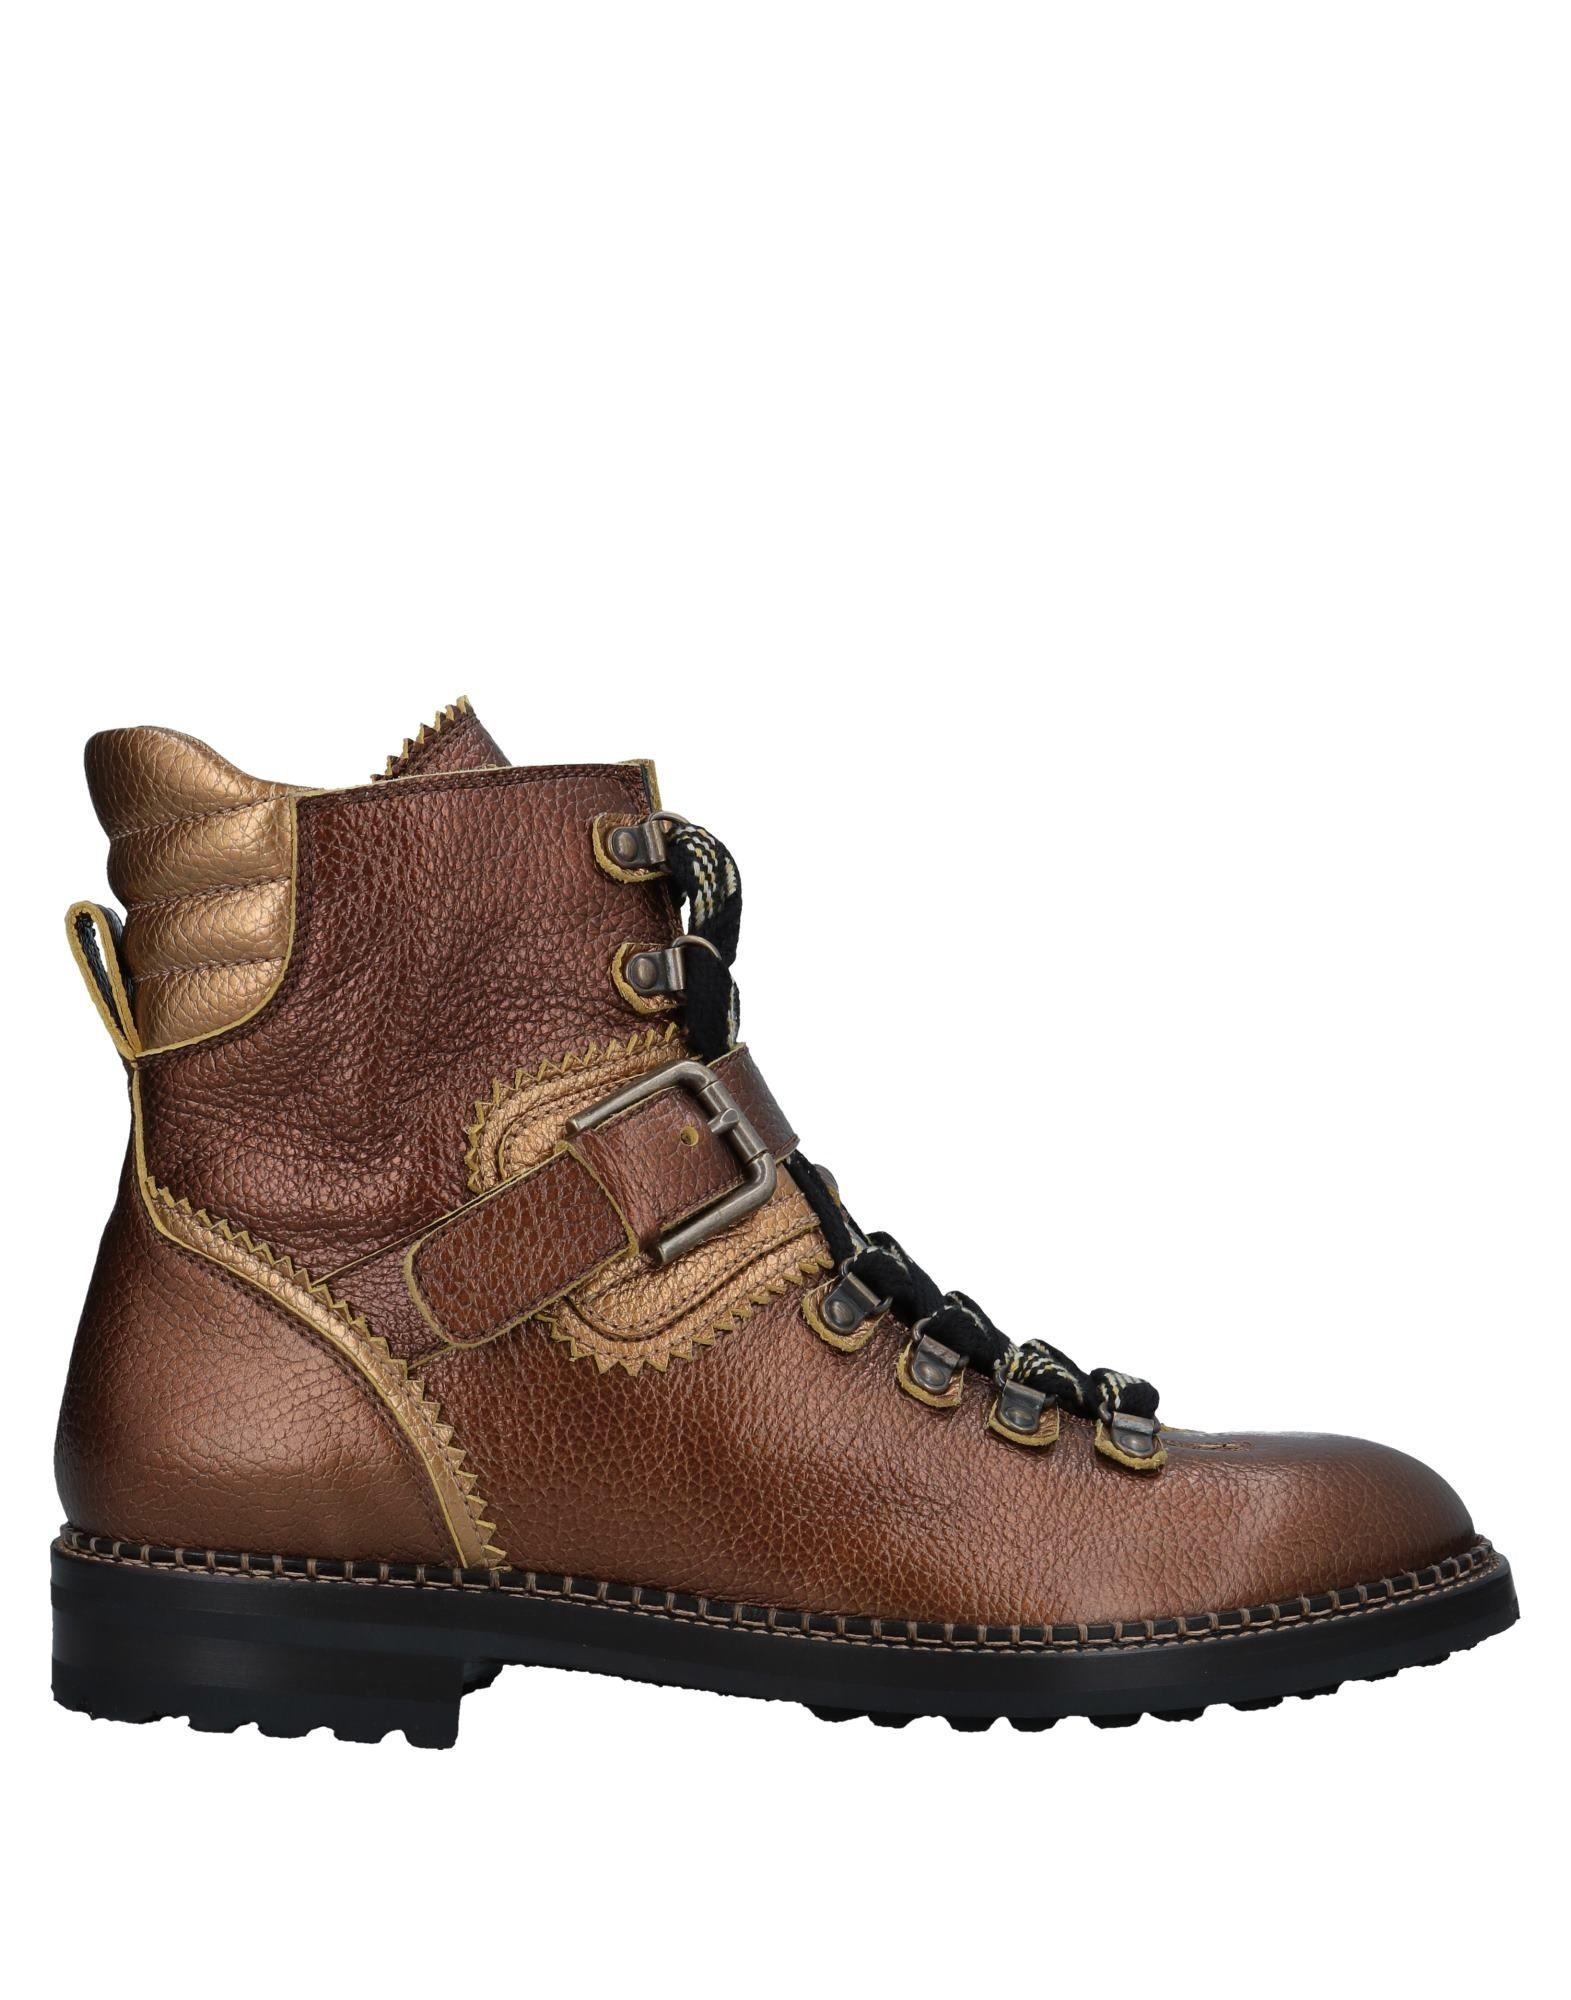 Dolce & Gabbana Boots - Men Dolce Dolce Dolce & Gabbana Boots online on  United Kingdom - 11547569RJ a505ed